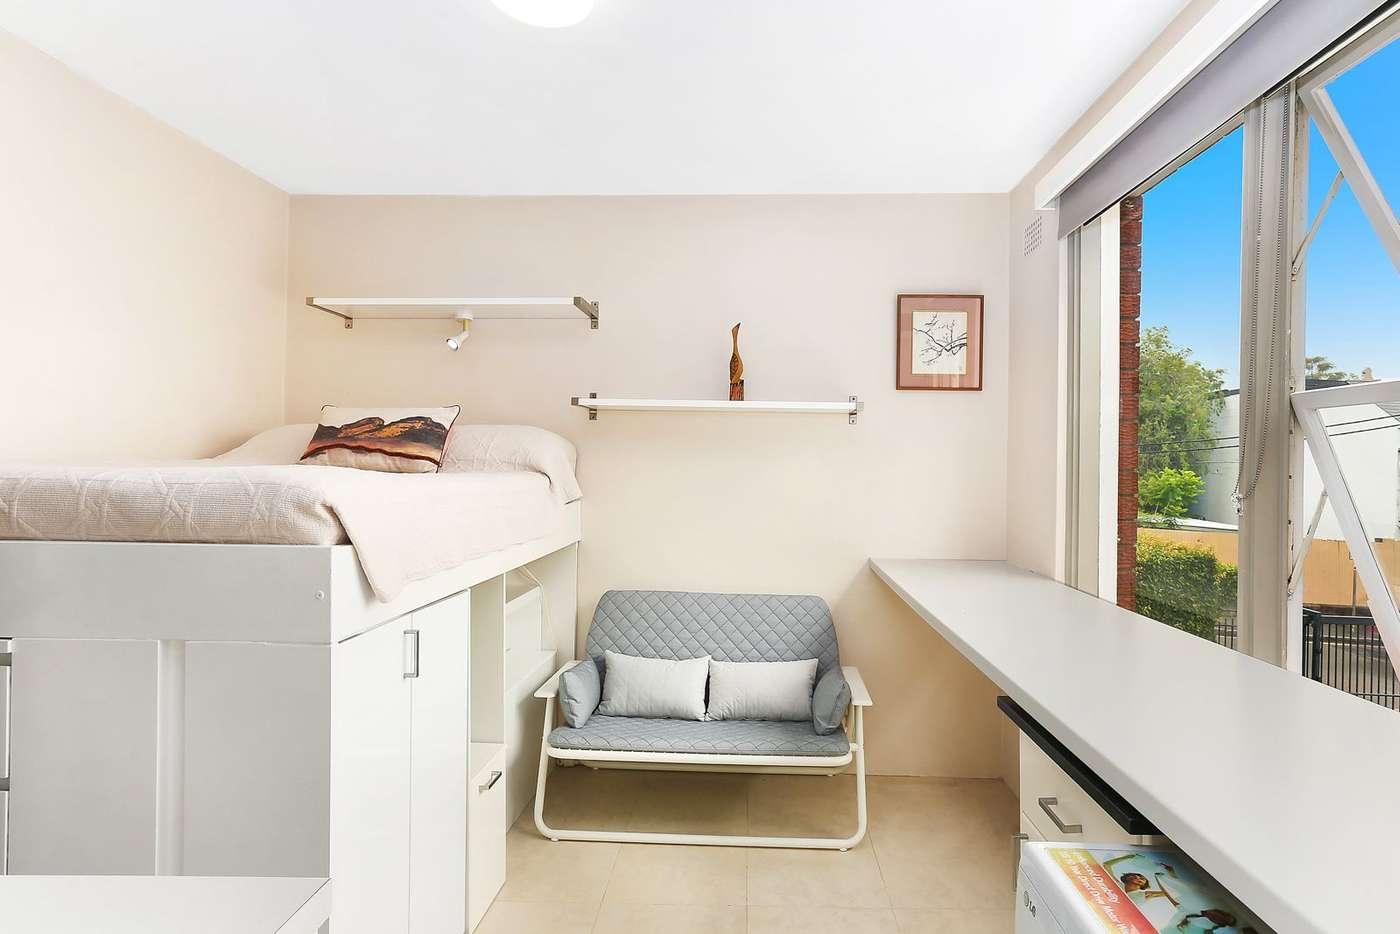 Main view of Homely studio listing, 2/6 Underwood Street, Paddington NSW 2021